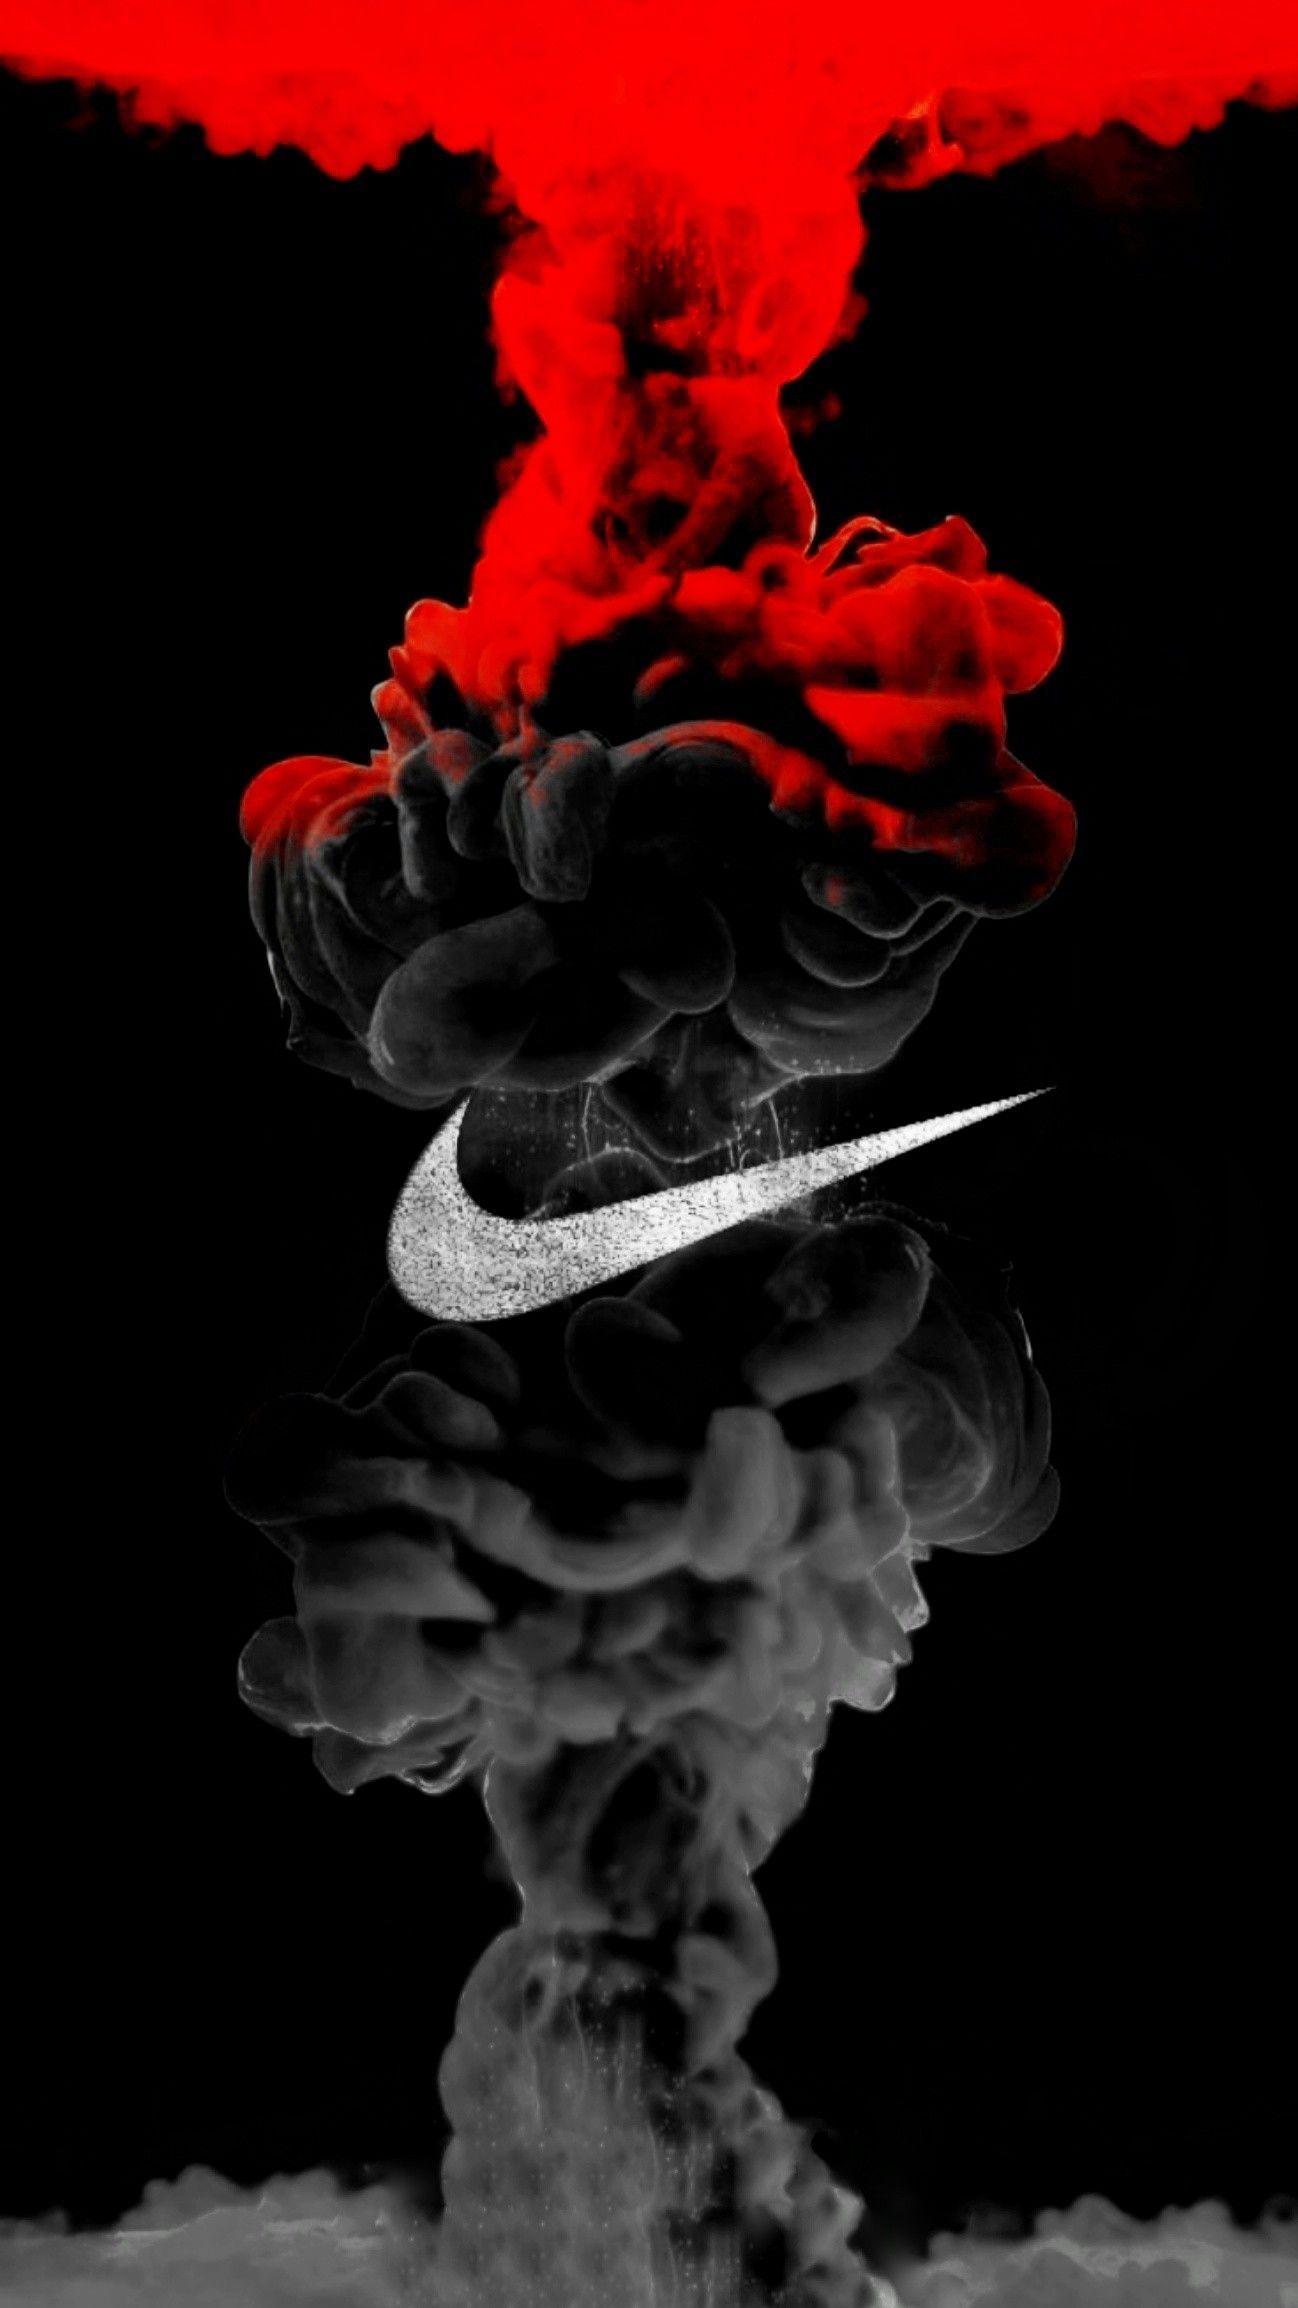 Cool Adidas Football Wallpaper